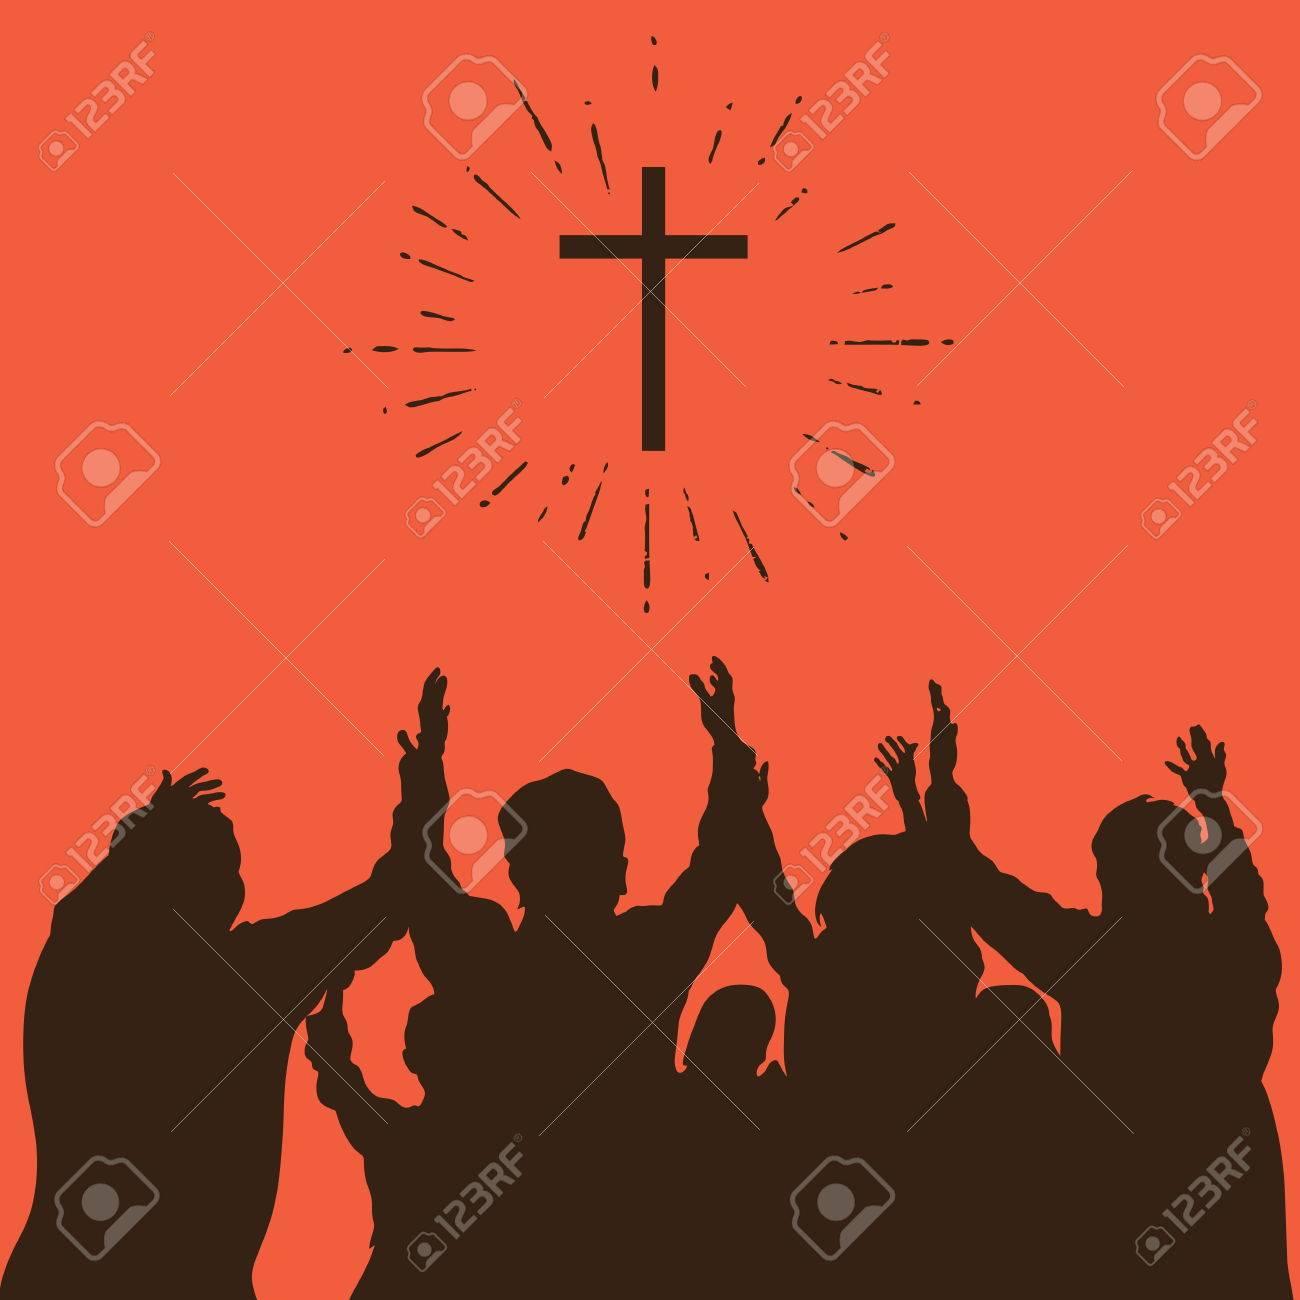 Group worship, raised hands, cross, worship, silhouettes, praise - 46671749